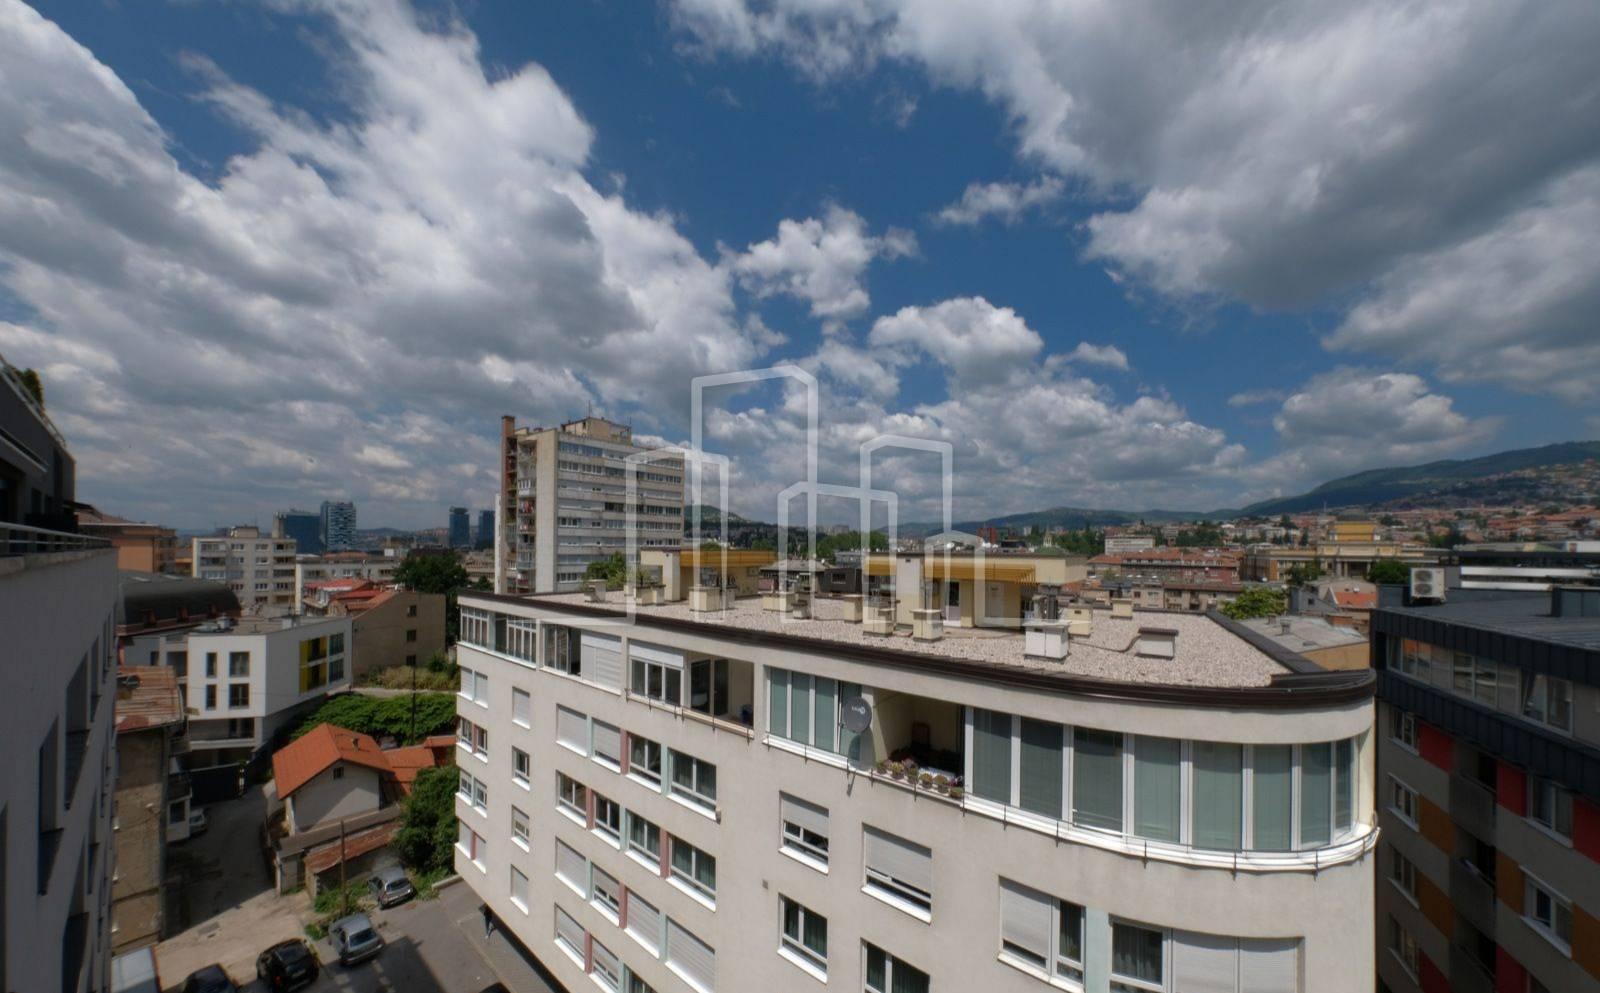 najam četverosoban opremljen stan Skenderija Sarajevo